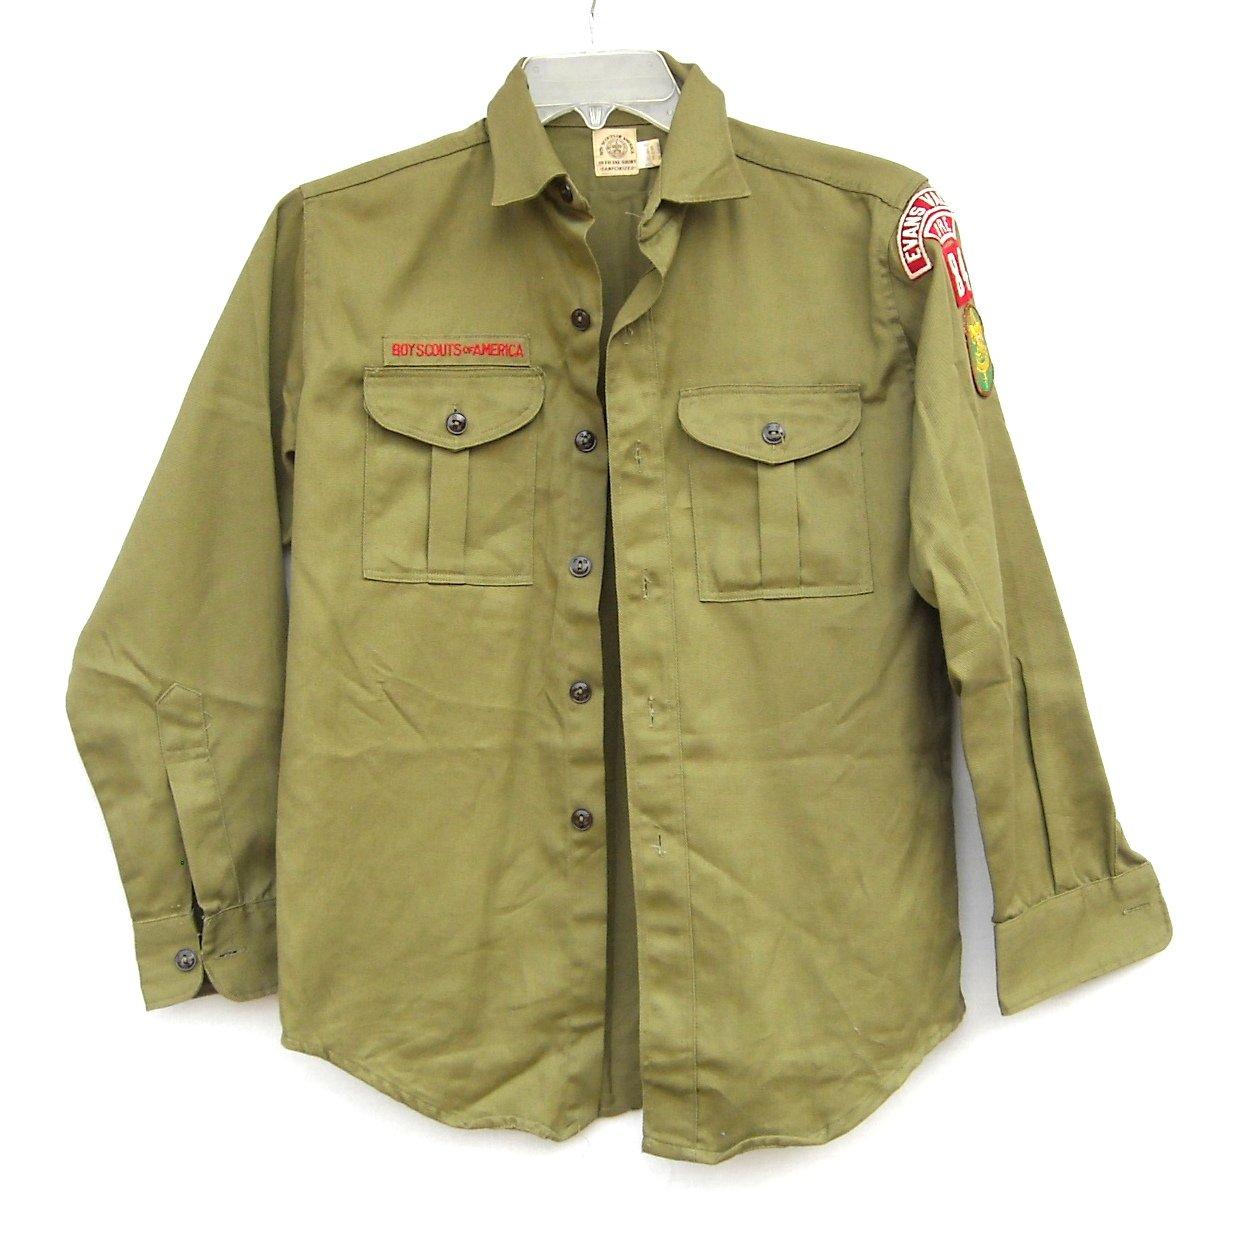 Boy Scouts Of America Vintage Uniform Shirt size 14.5